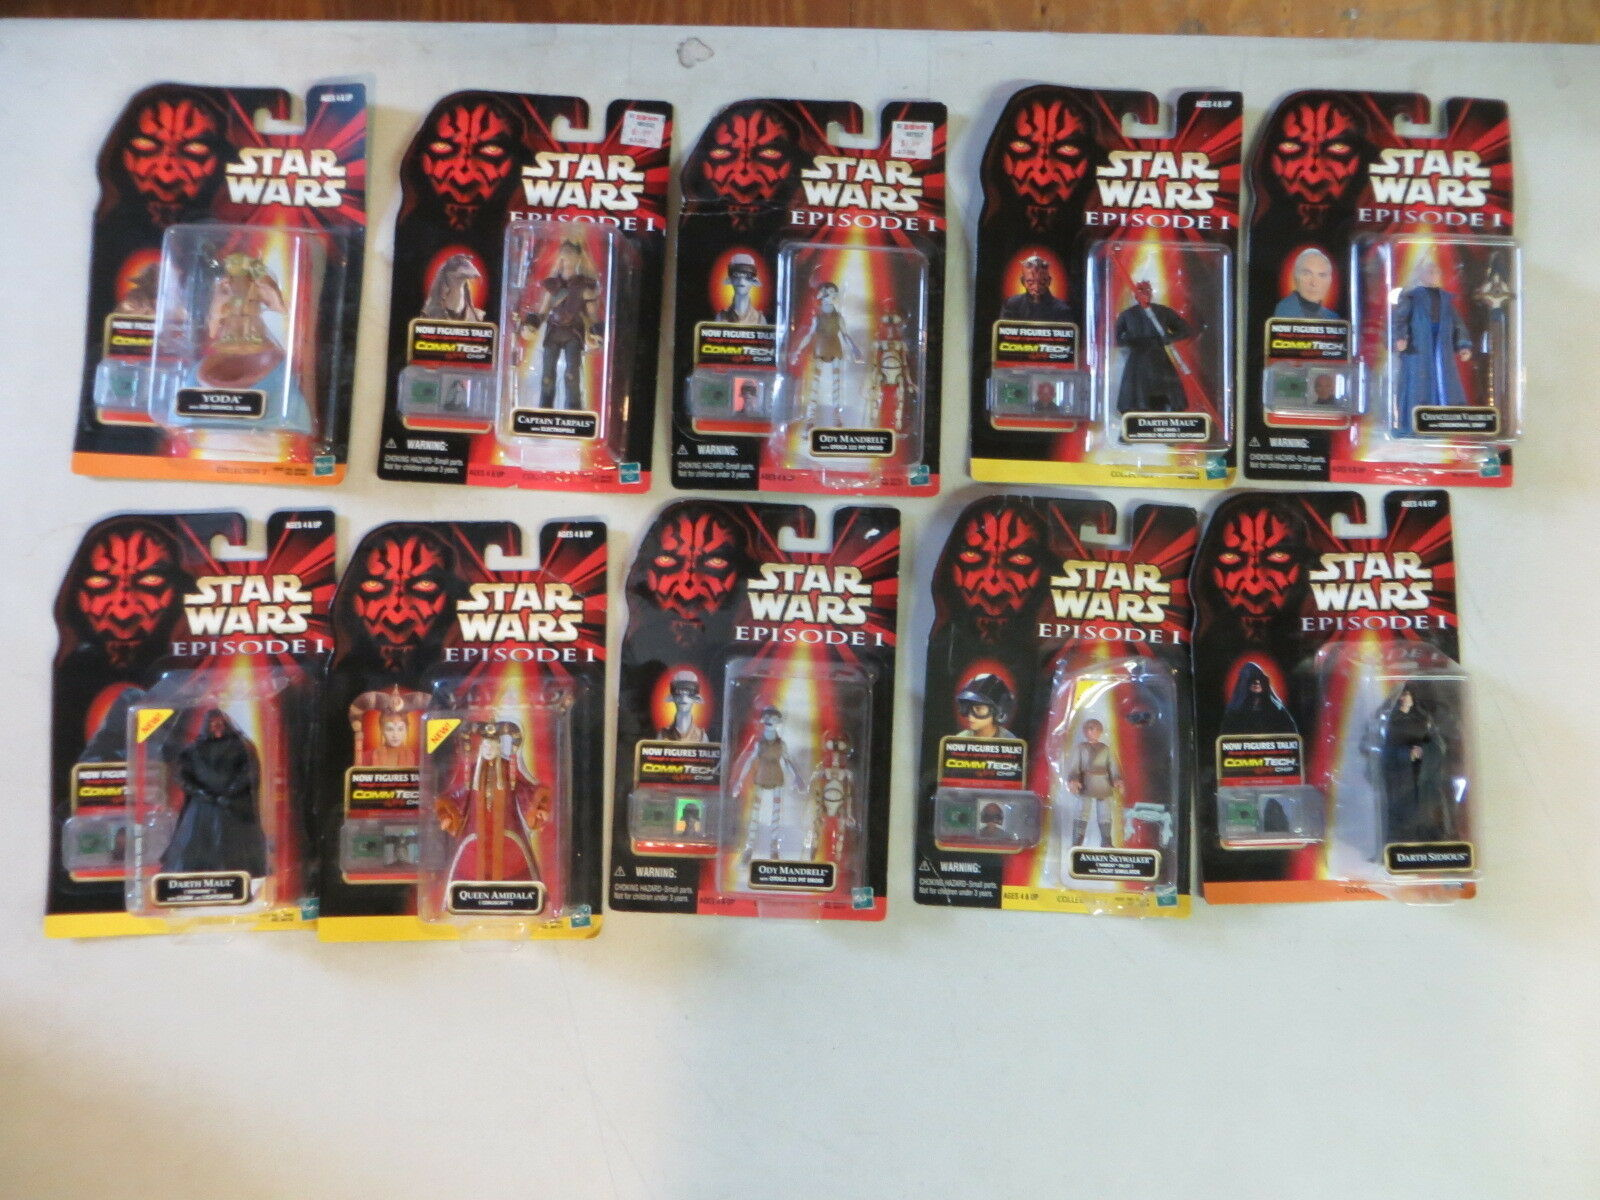 Star Wars Episode 1 14 Figur Viele Darth Maul Amidala Anakin Skywalker B